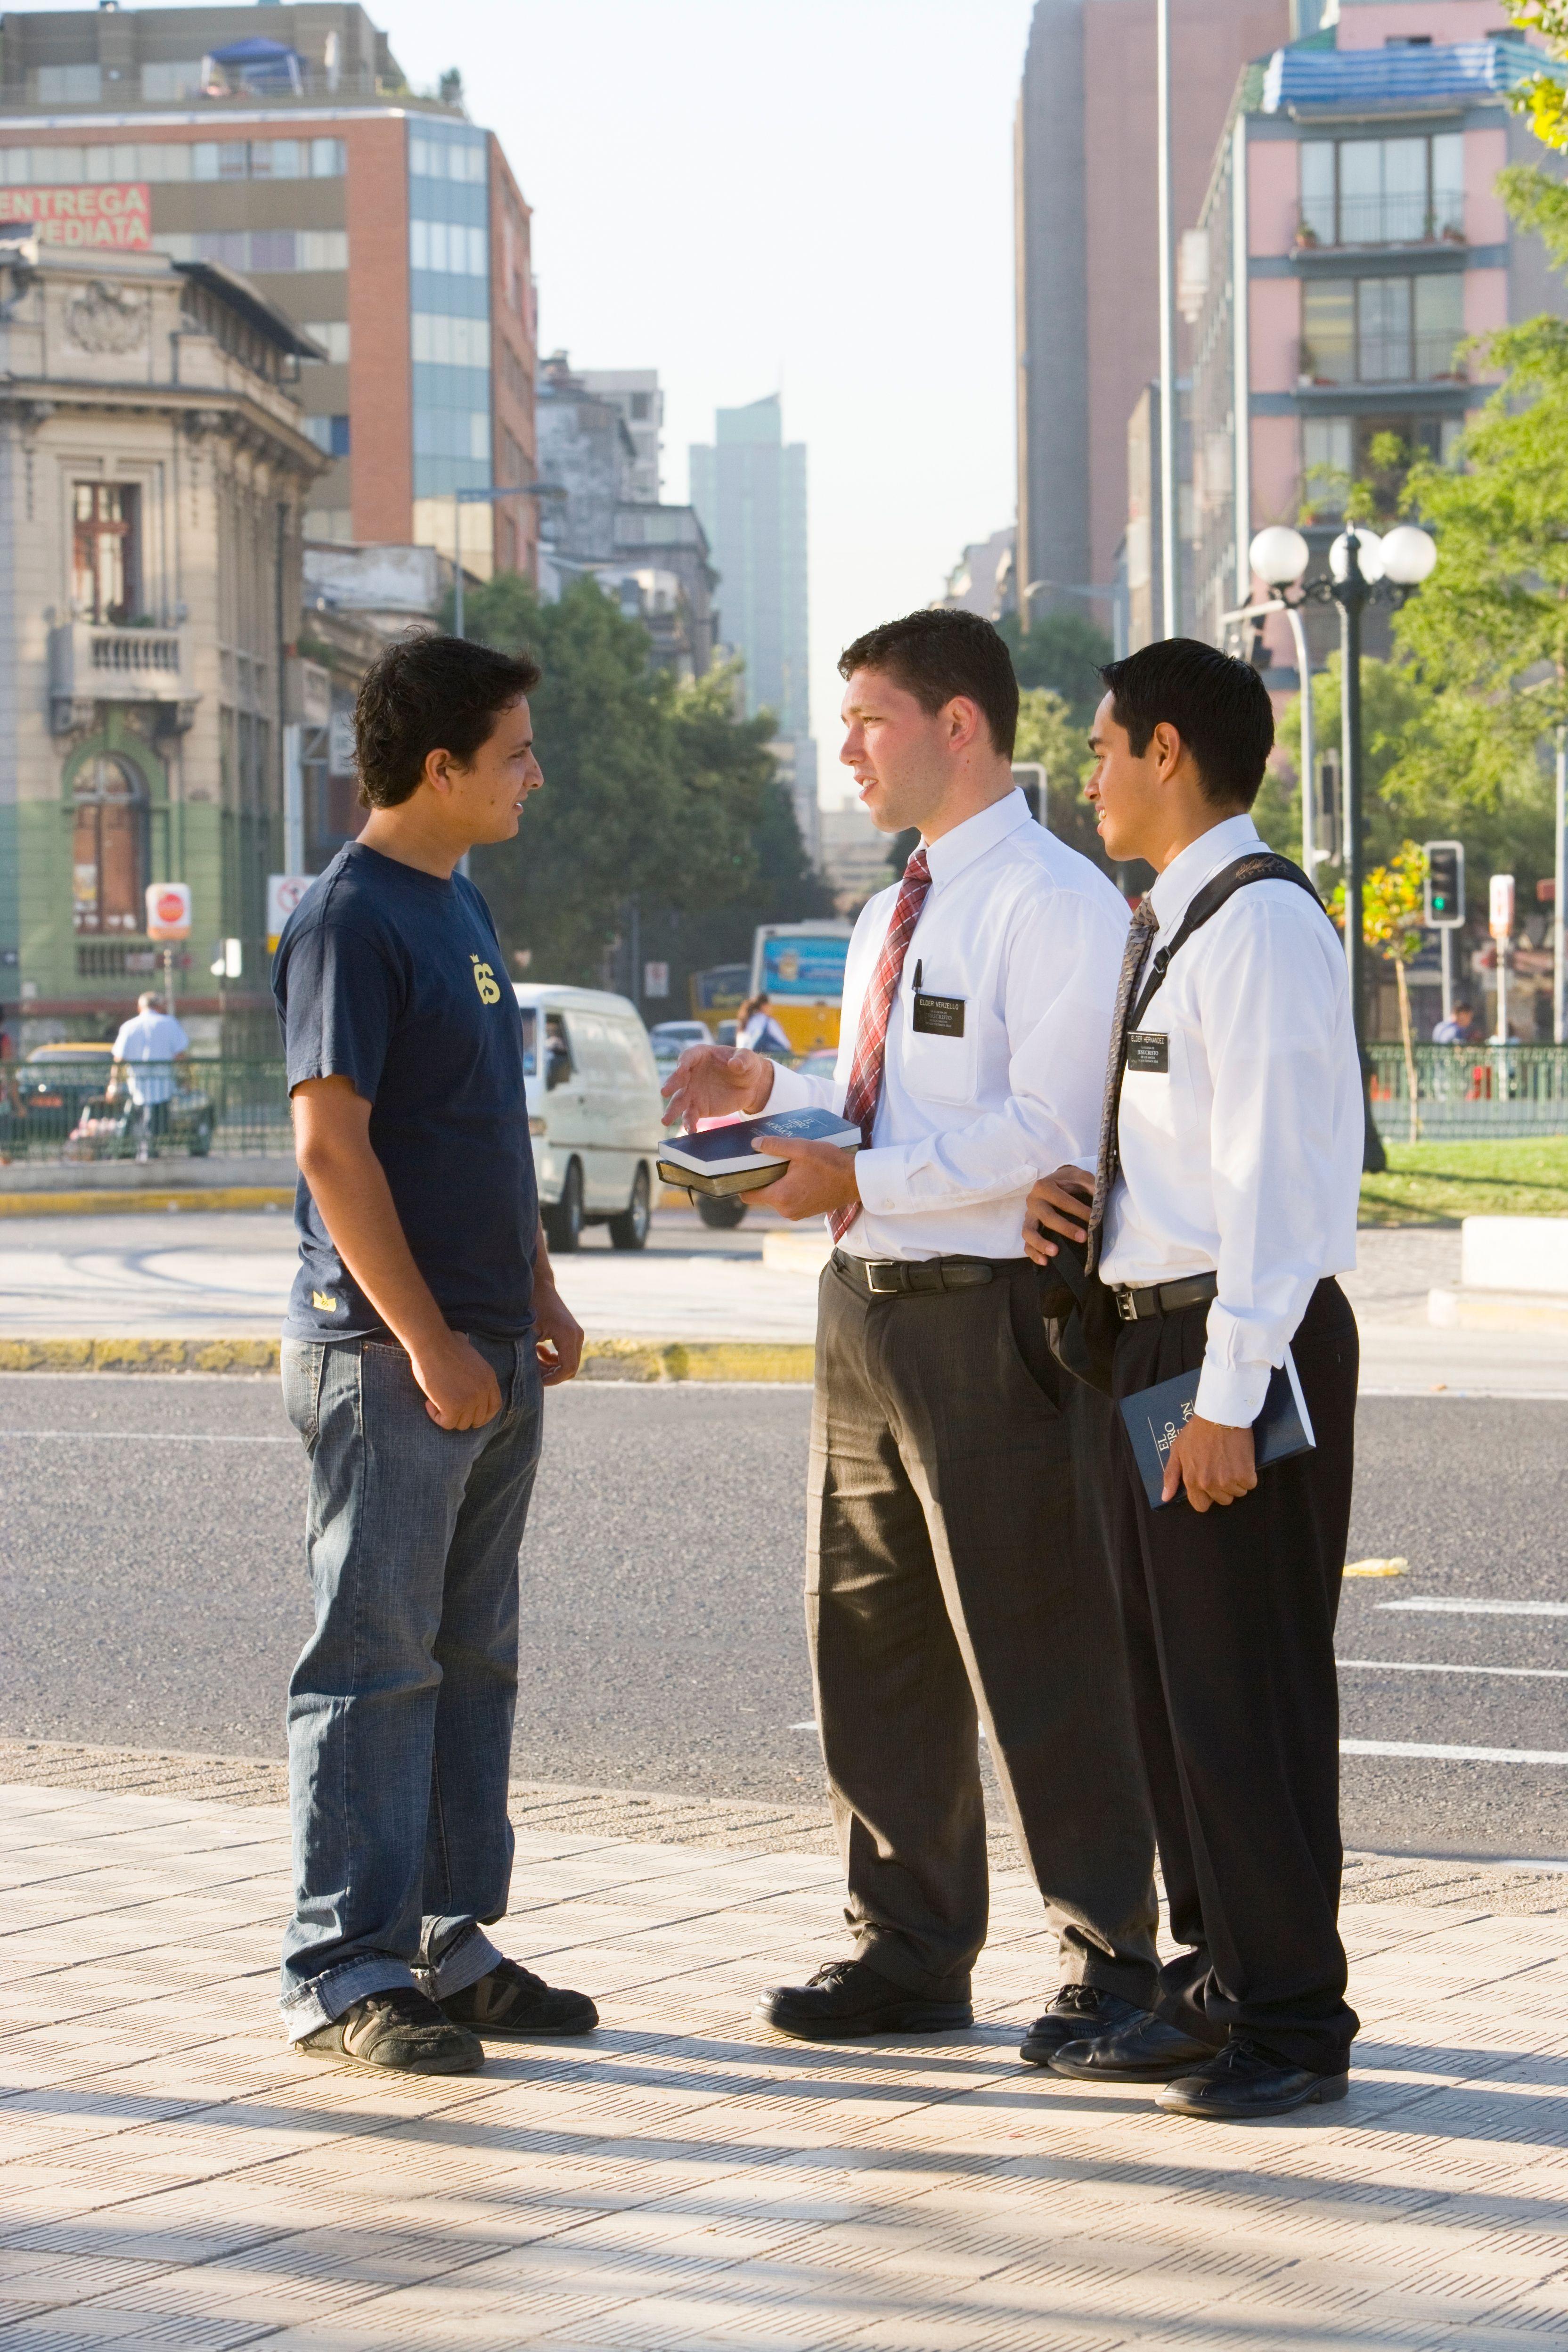 Missionaries: Elders; GAB 109; Matthew 28:19; Alma 26:1–16